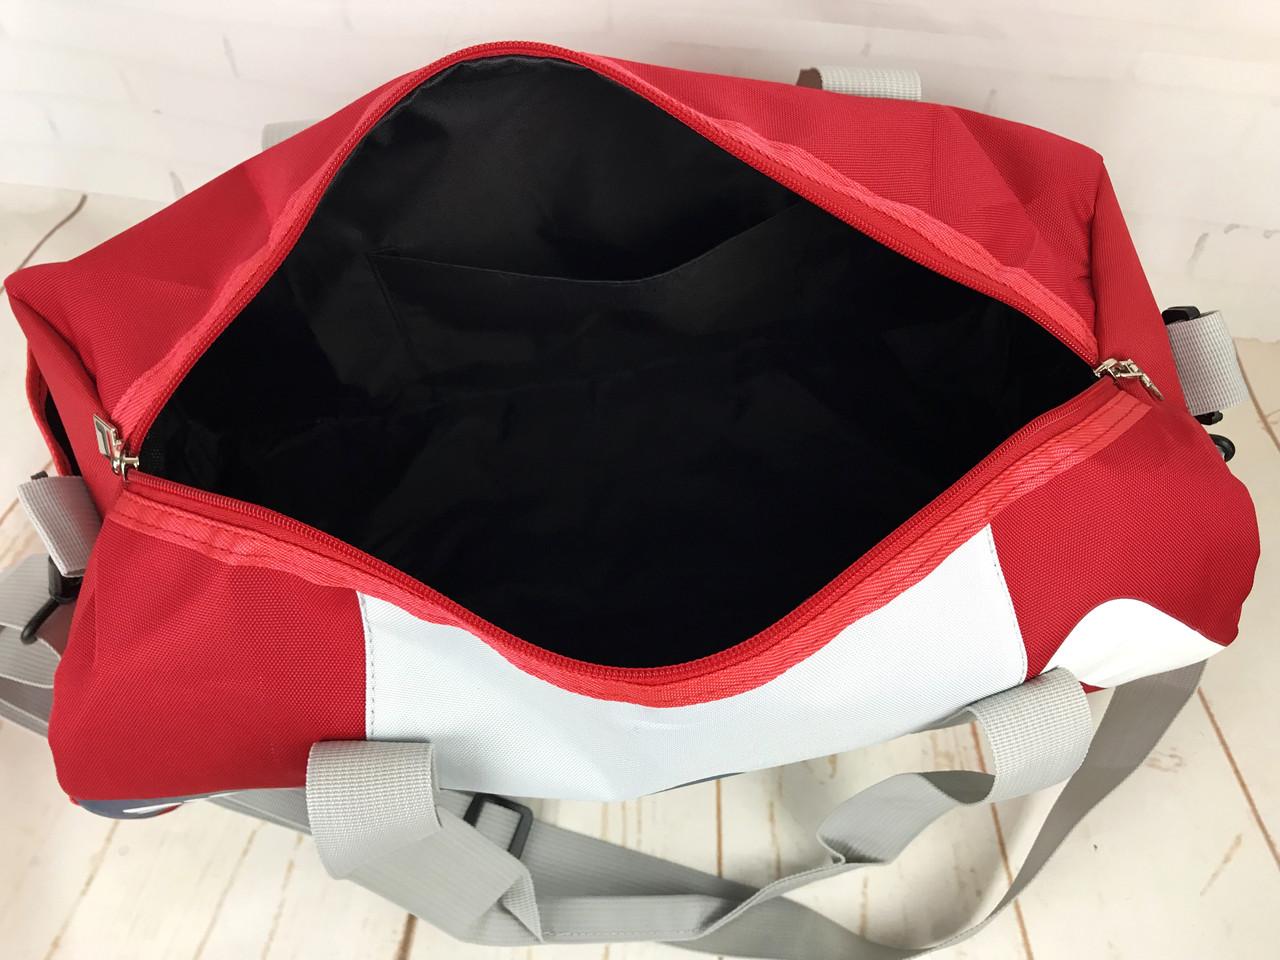 45b0f50738f4 Небольшая красивая спортивная сумка бочонок Fila. Размер 44см на 23 КСС12-1,  цена 399 грн., купить в Бердянске — Prom.ua (ID#870534147)